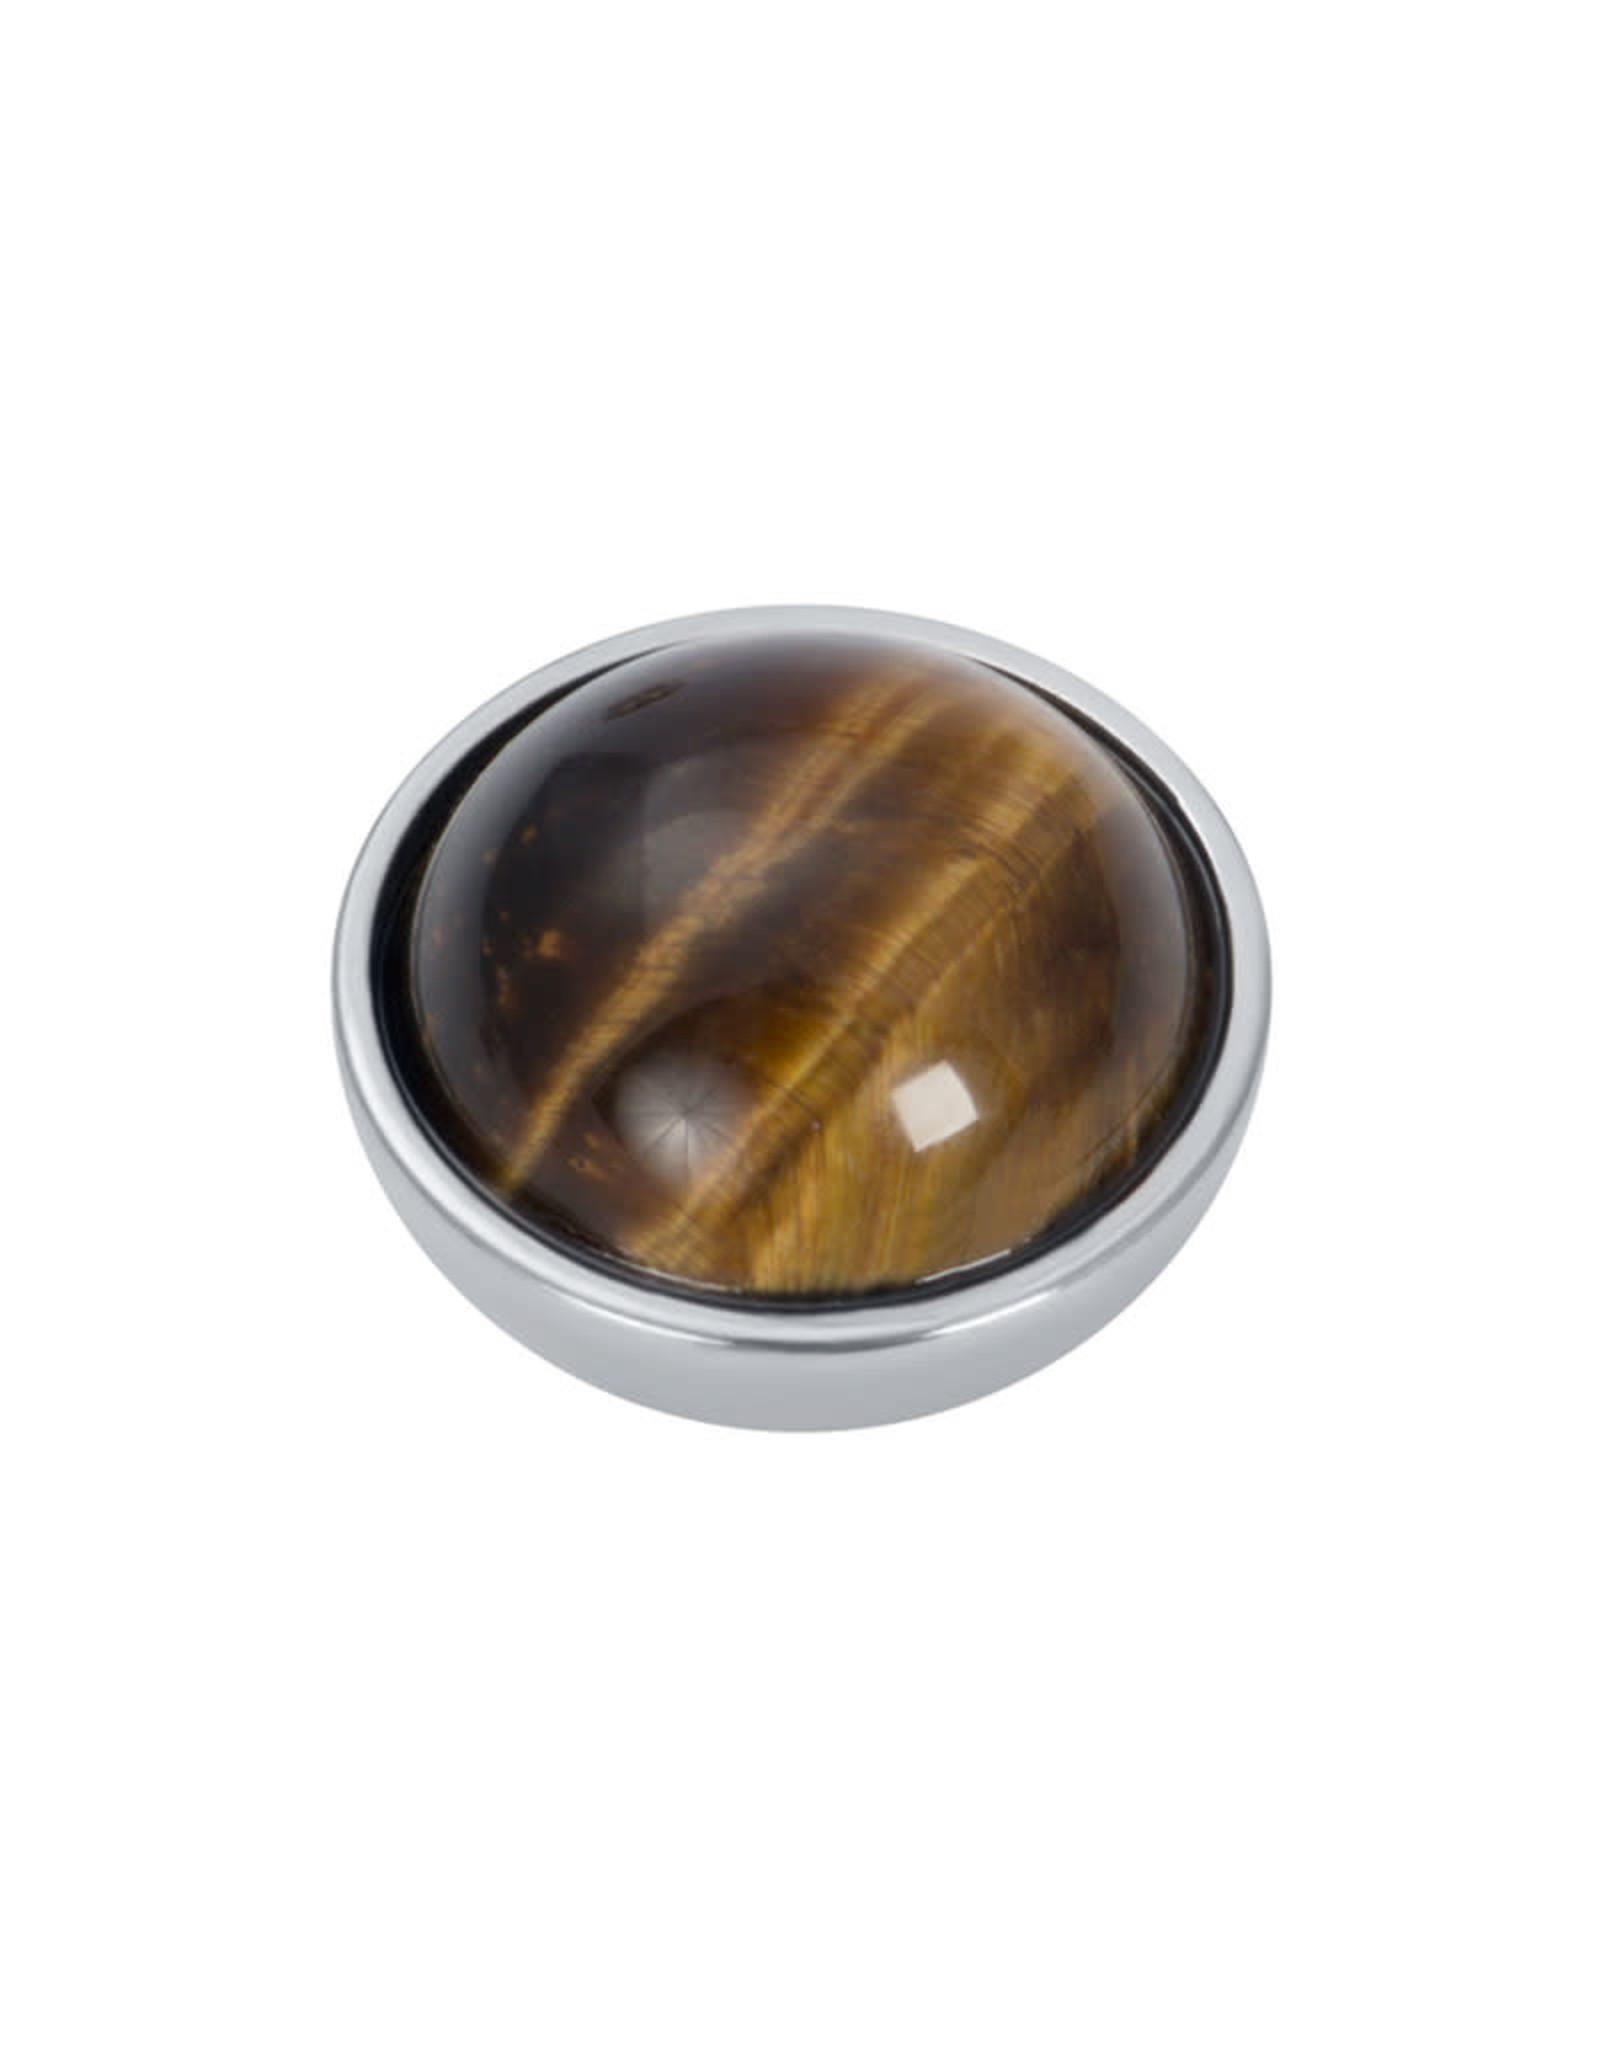 iXXXi Jewelry iXXXi top part brown amber stone